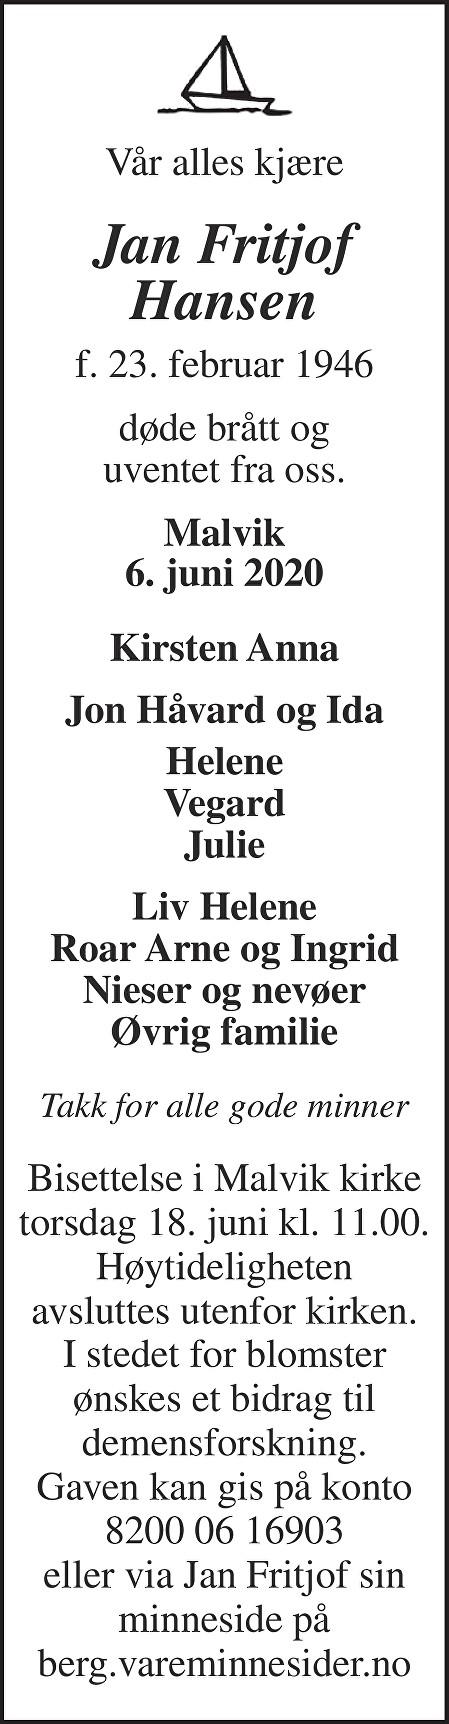 Jan Fritjof Hansen Dødsannonse